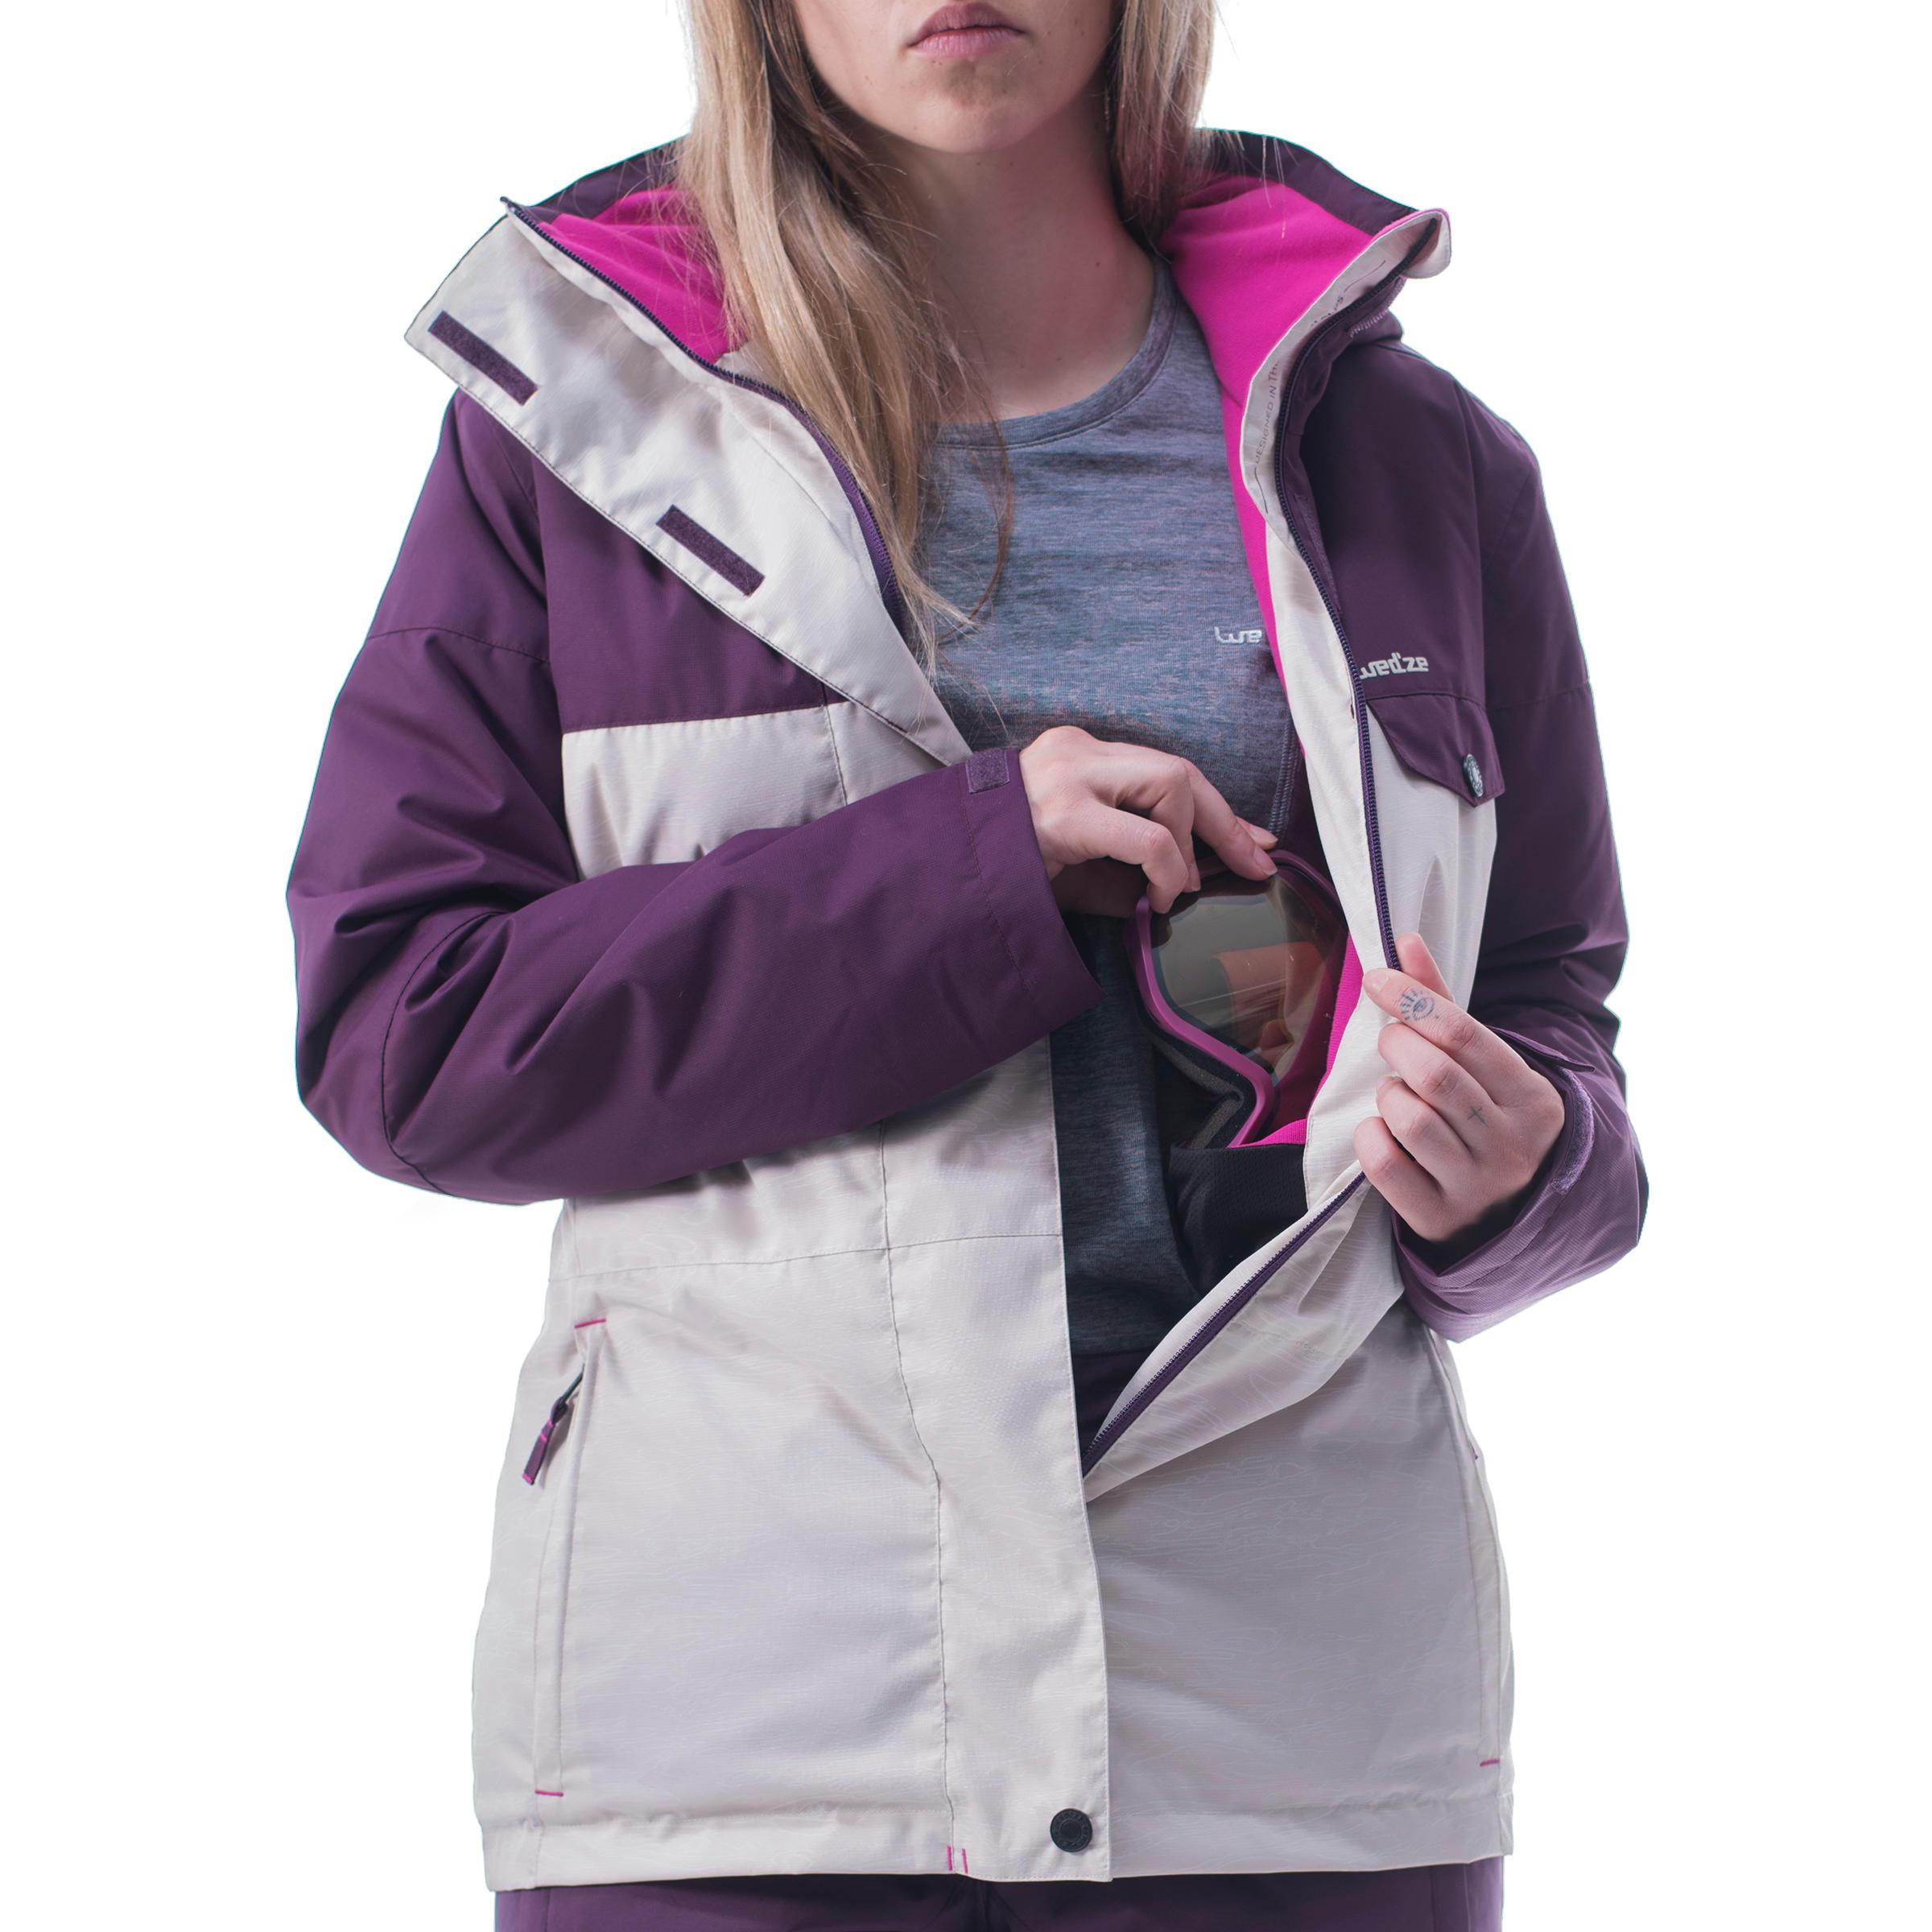 62f66393b3 manteau-de-planche-a-neige-et-de-ski-femme-snb-jkt-100-beige-et-prune.jpg